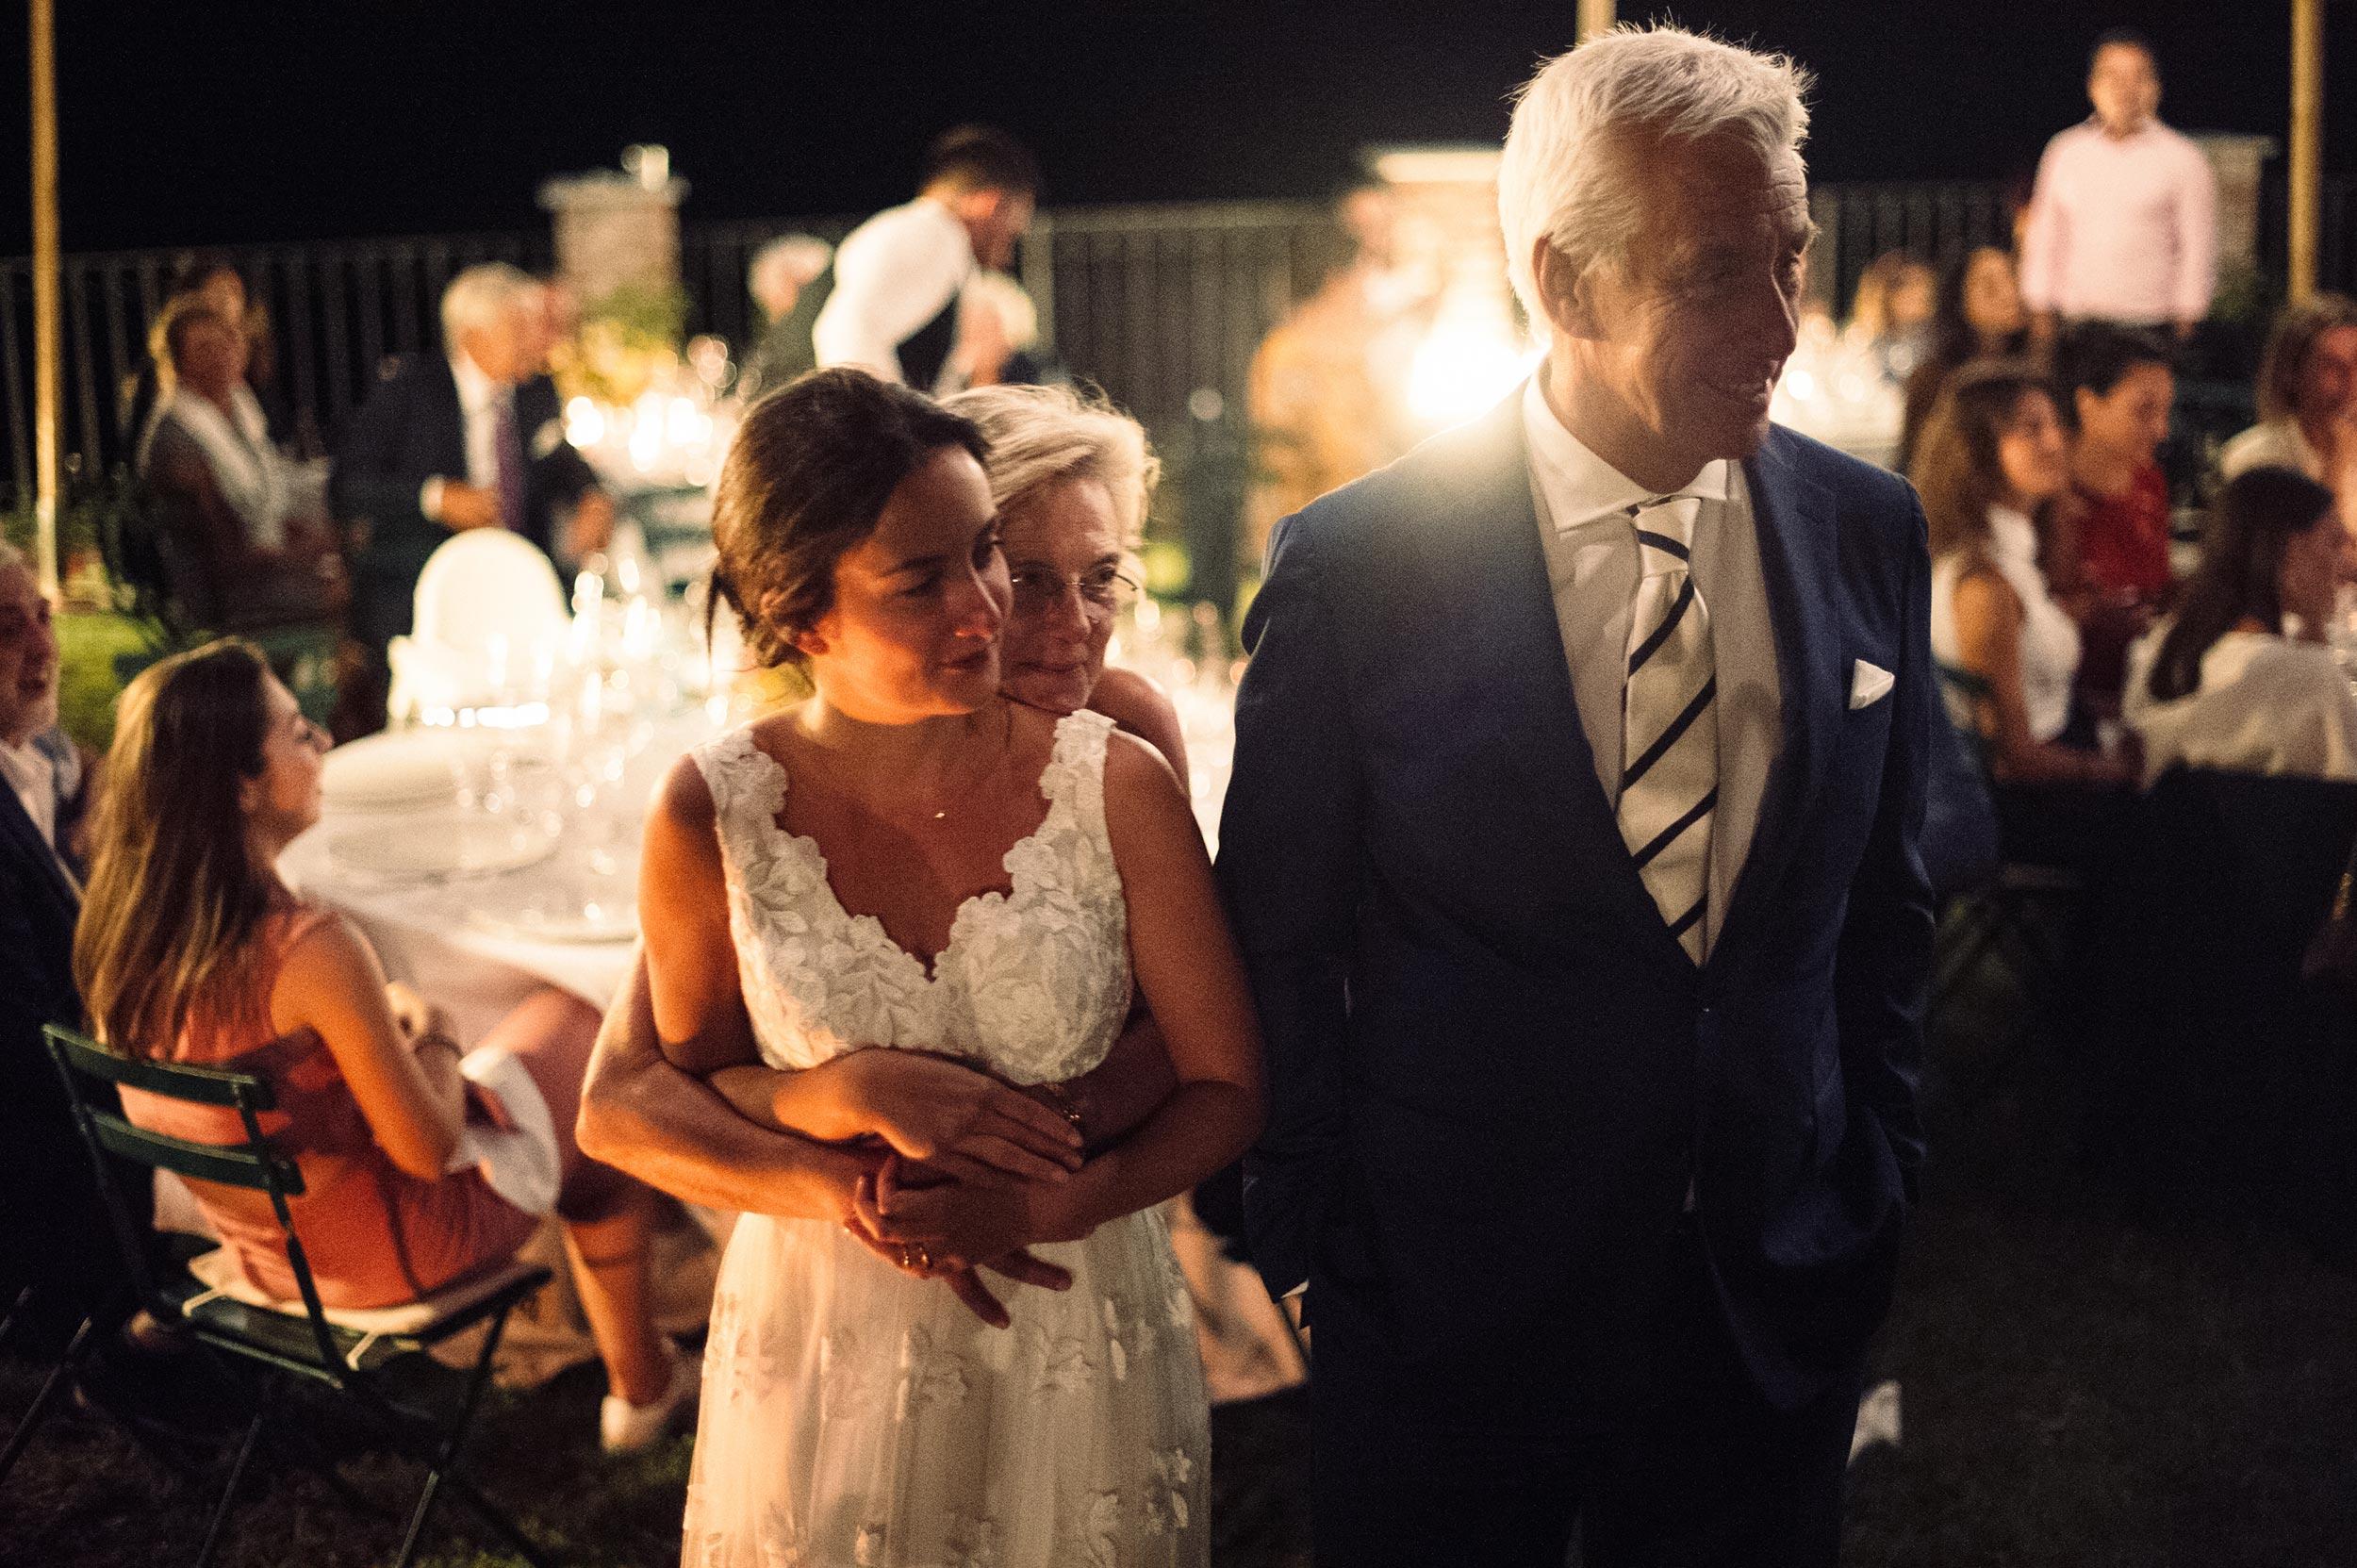 2016-Davor-Chiara-Monferrato-Asti-Vercelli-Wedding-Photographer-Italy-Alessandro-Avenali-88.jpg